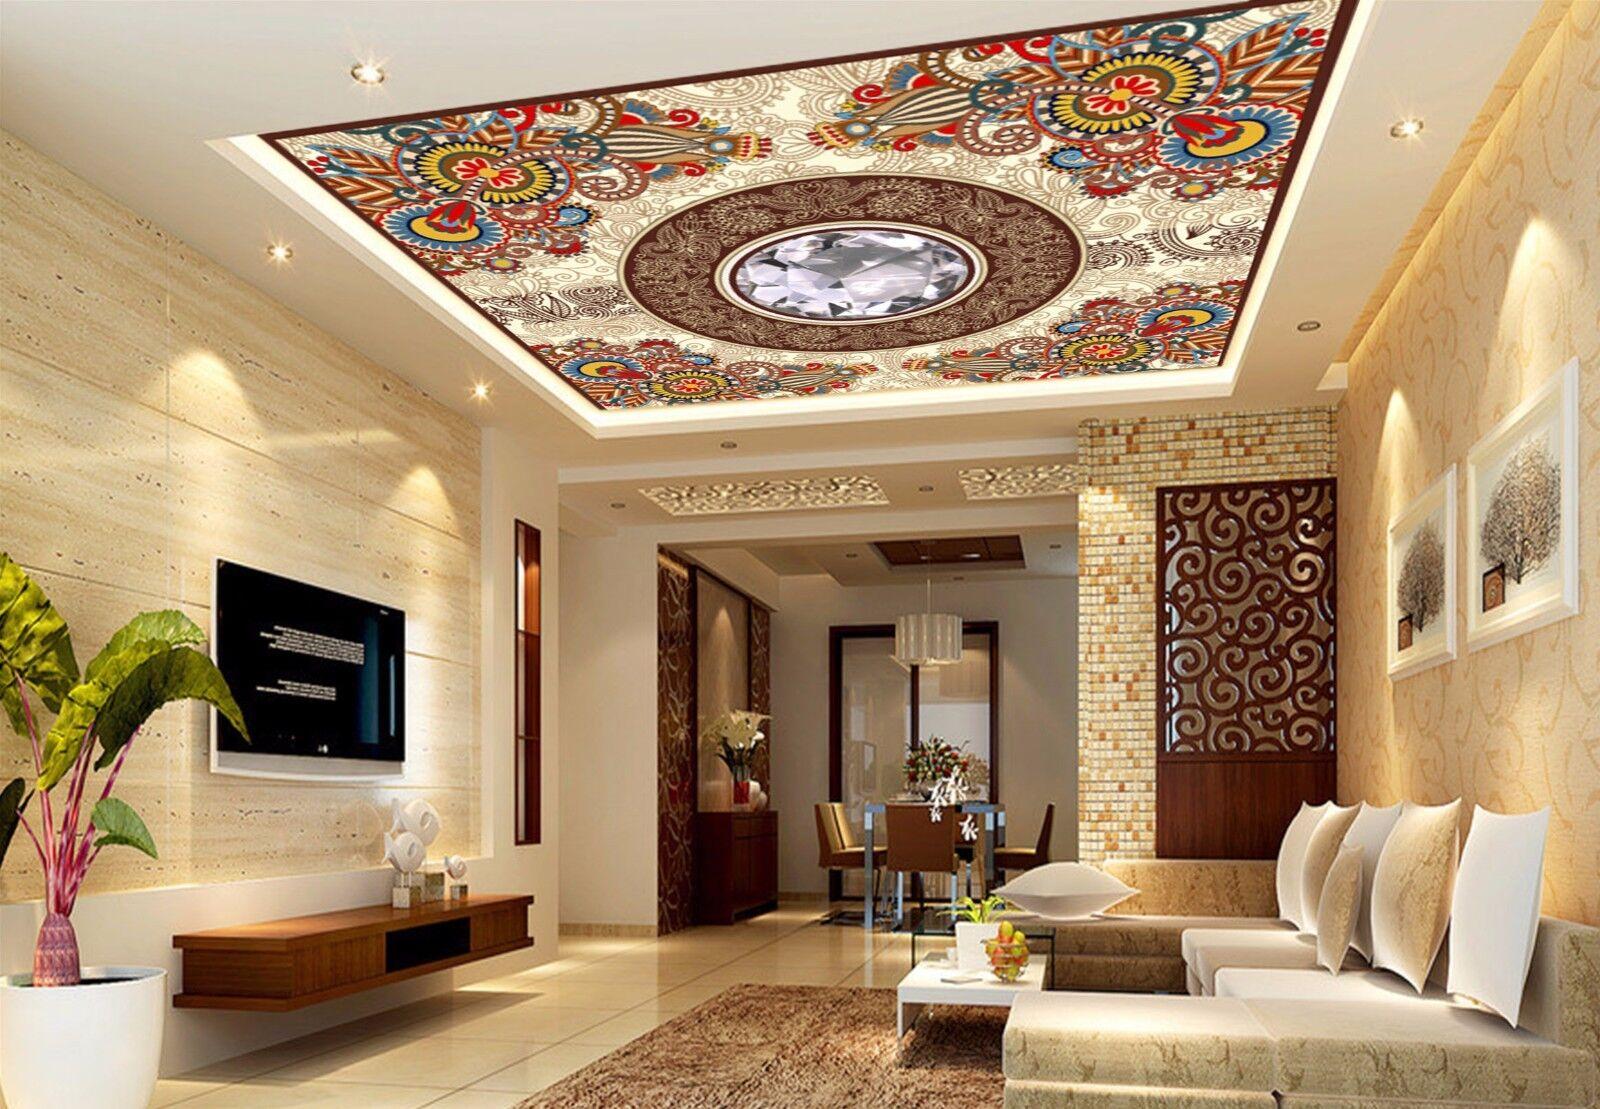 3D Diamond Pattern 8 Ceiling WallPaper Murals Wall Print Decal Deco AJ WALLPAPER